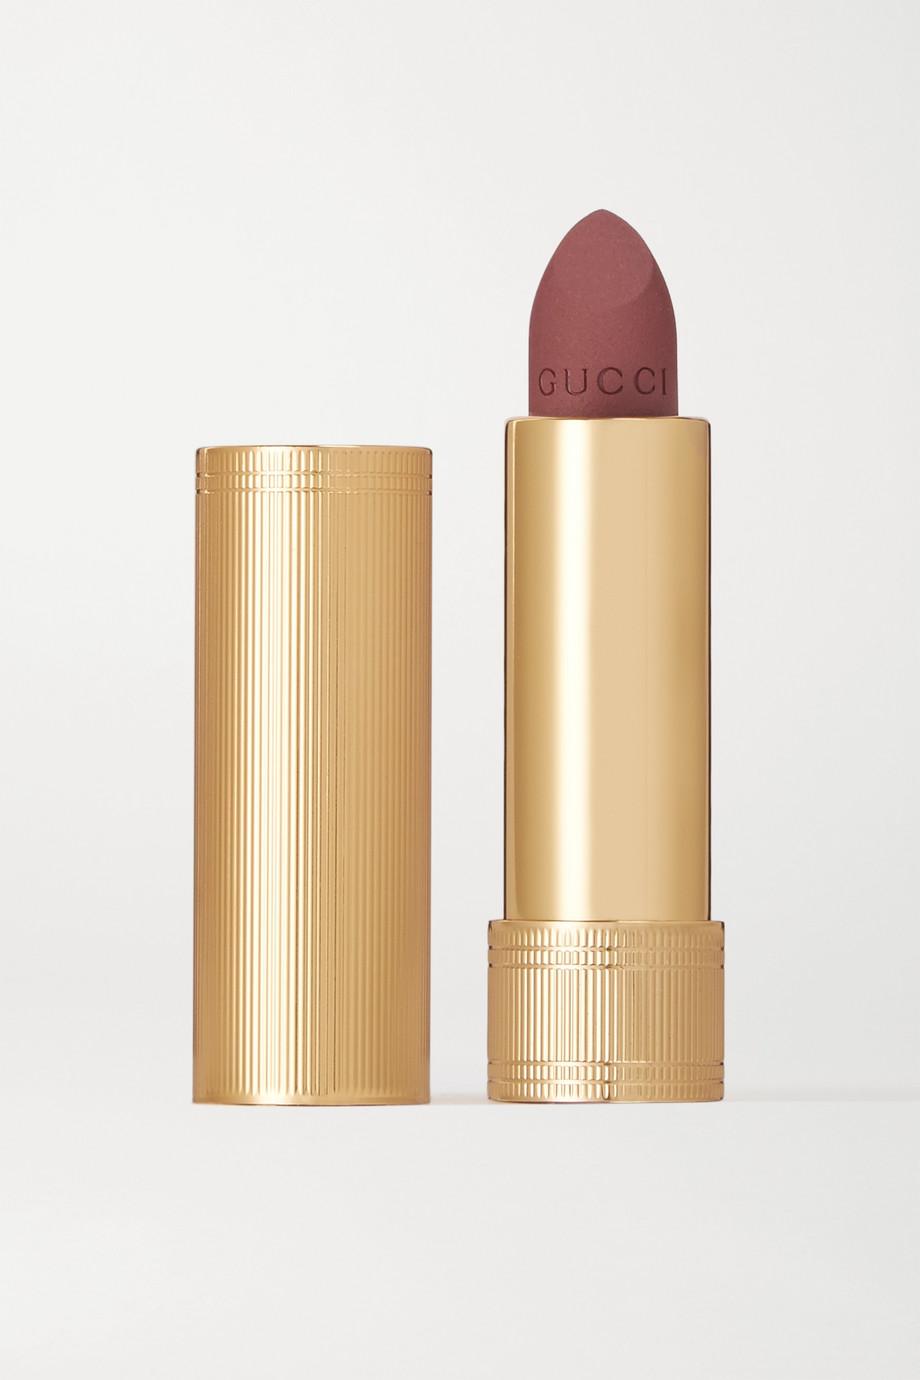 Gucci Beauty Rouge à Lèvres Mat Lipstick – Julie Rose 210 – Lippenstift